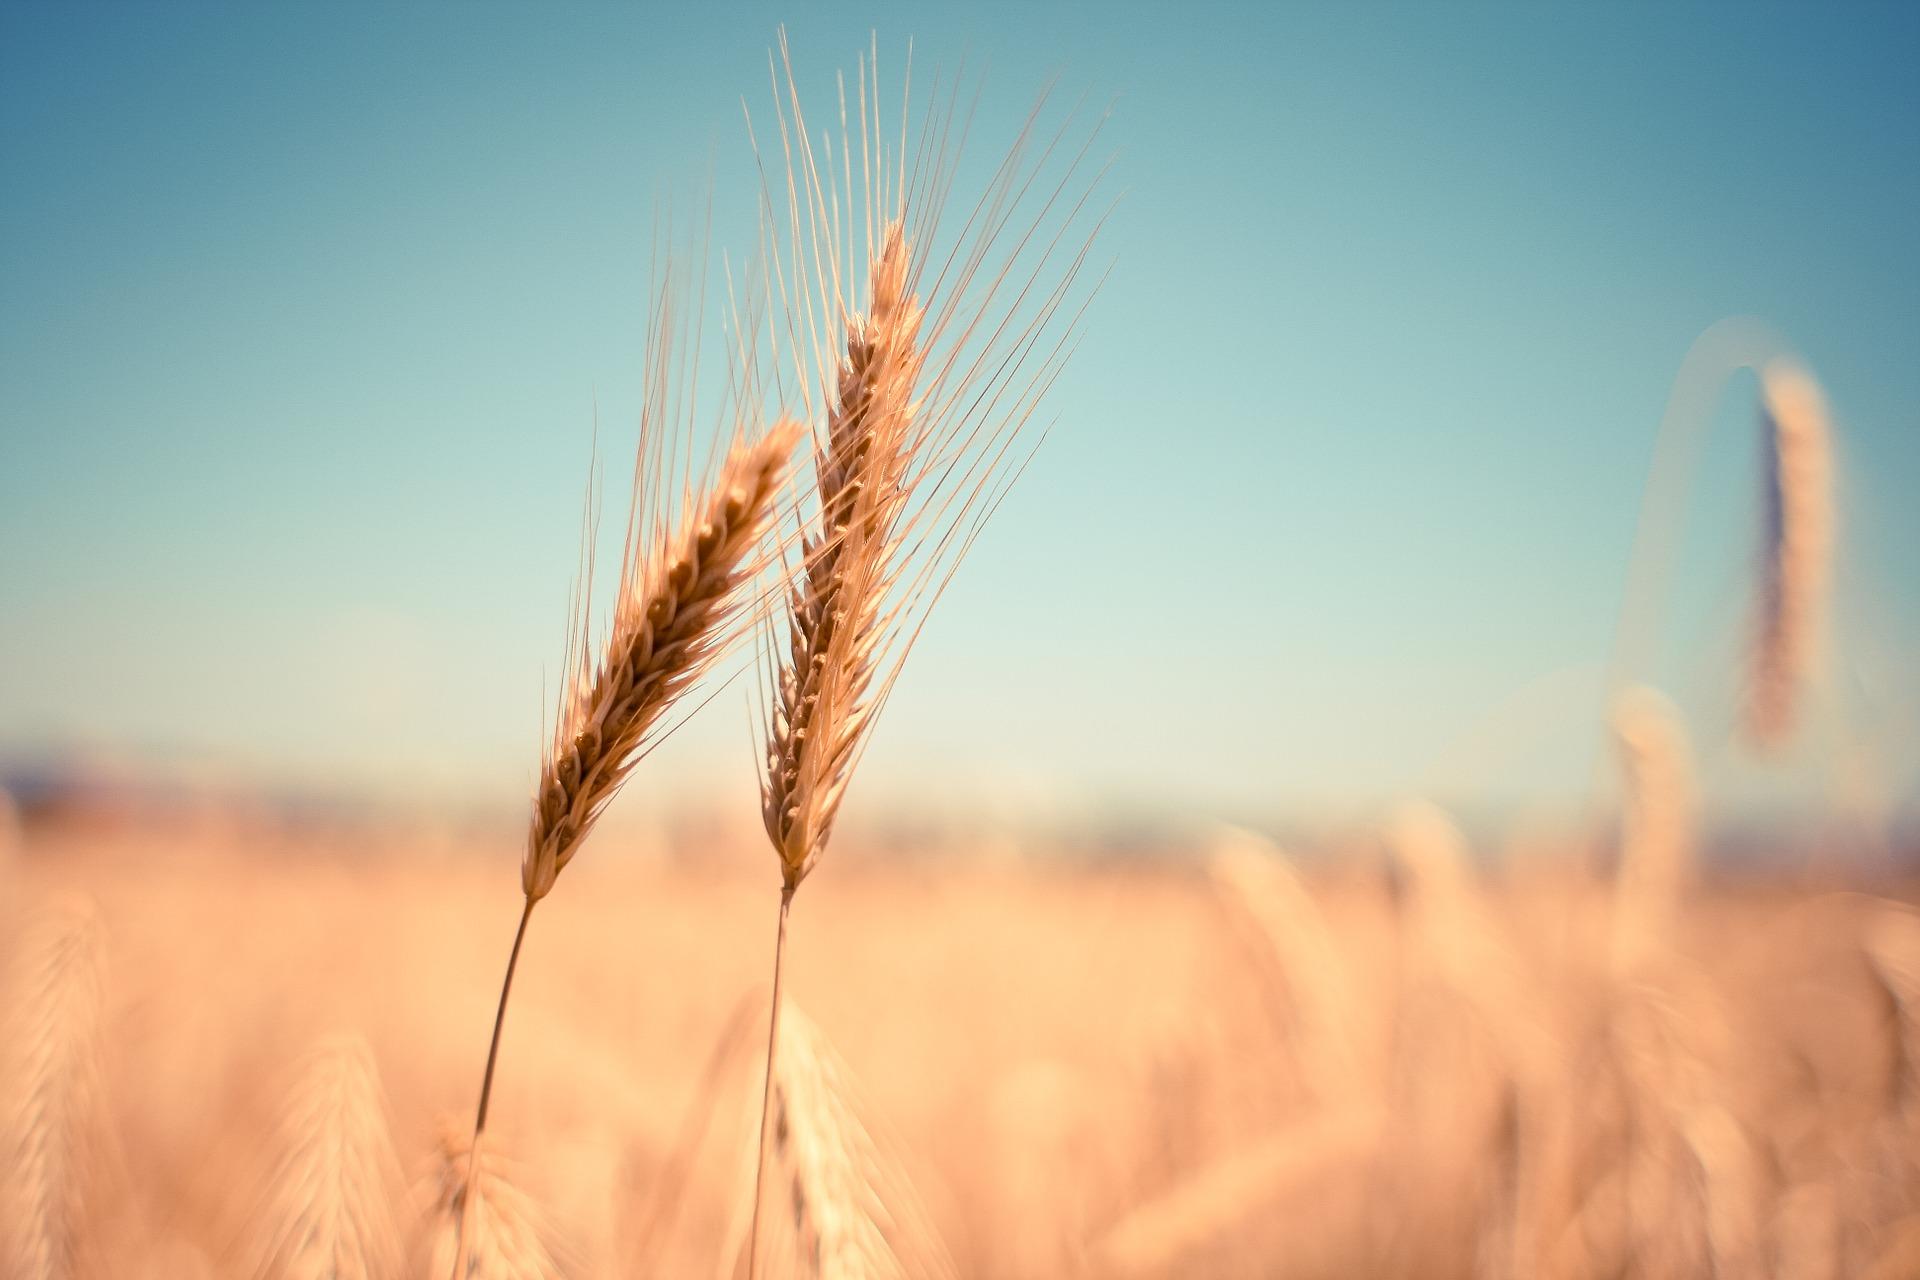 Alberta Wheat Commission and Farm Management Canada Announce Strategic Alliance